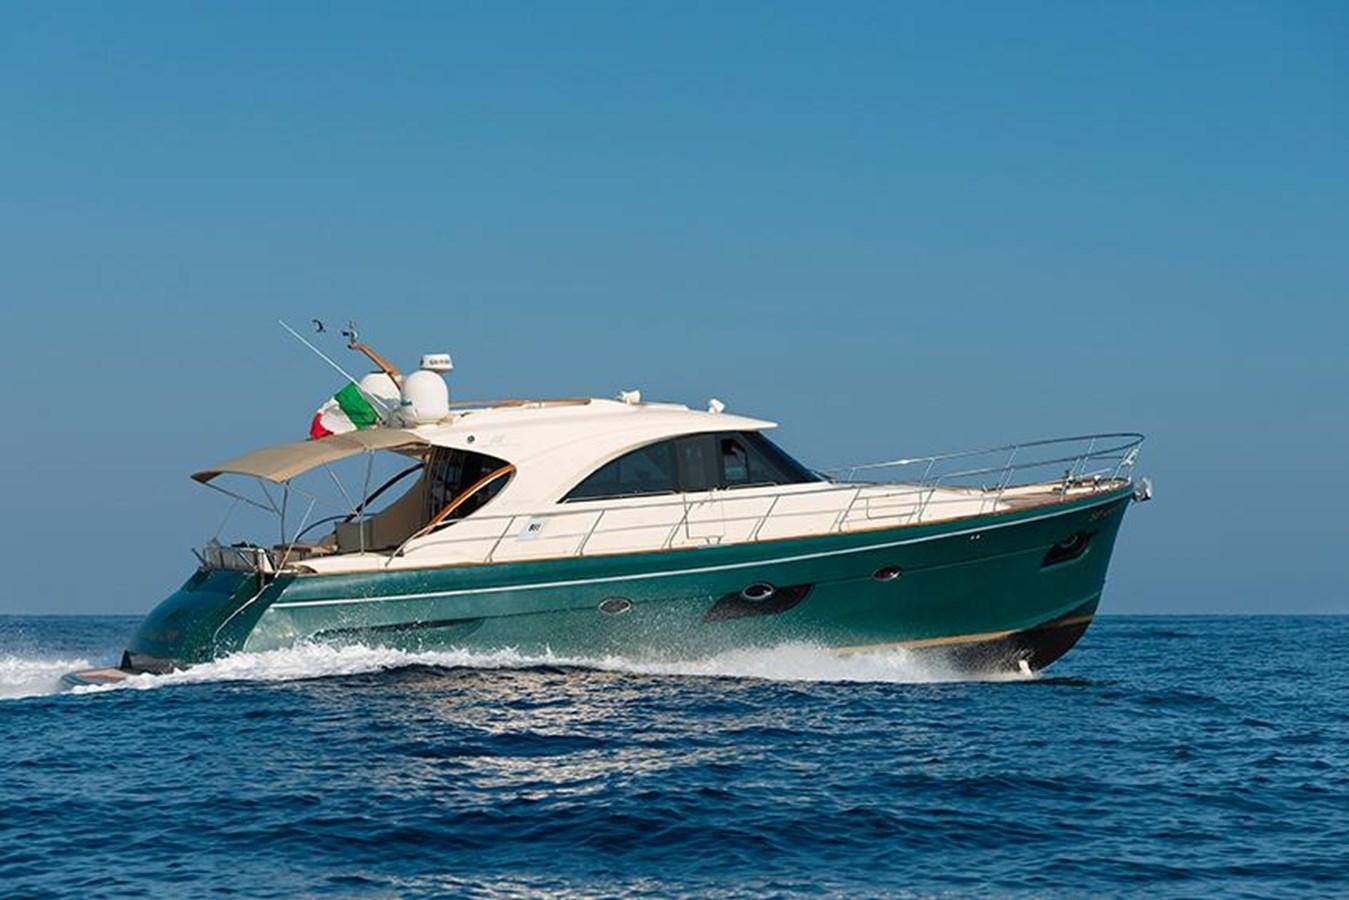 IMG-20200304-WA0021 2011 ABATI YACHTS kEYPORT 60 Motor Yacht 2879781